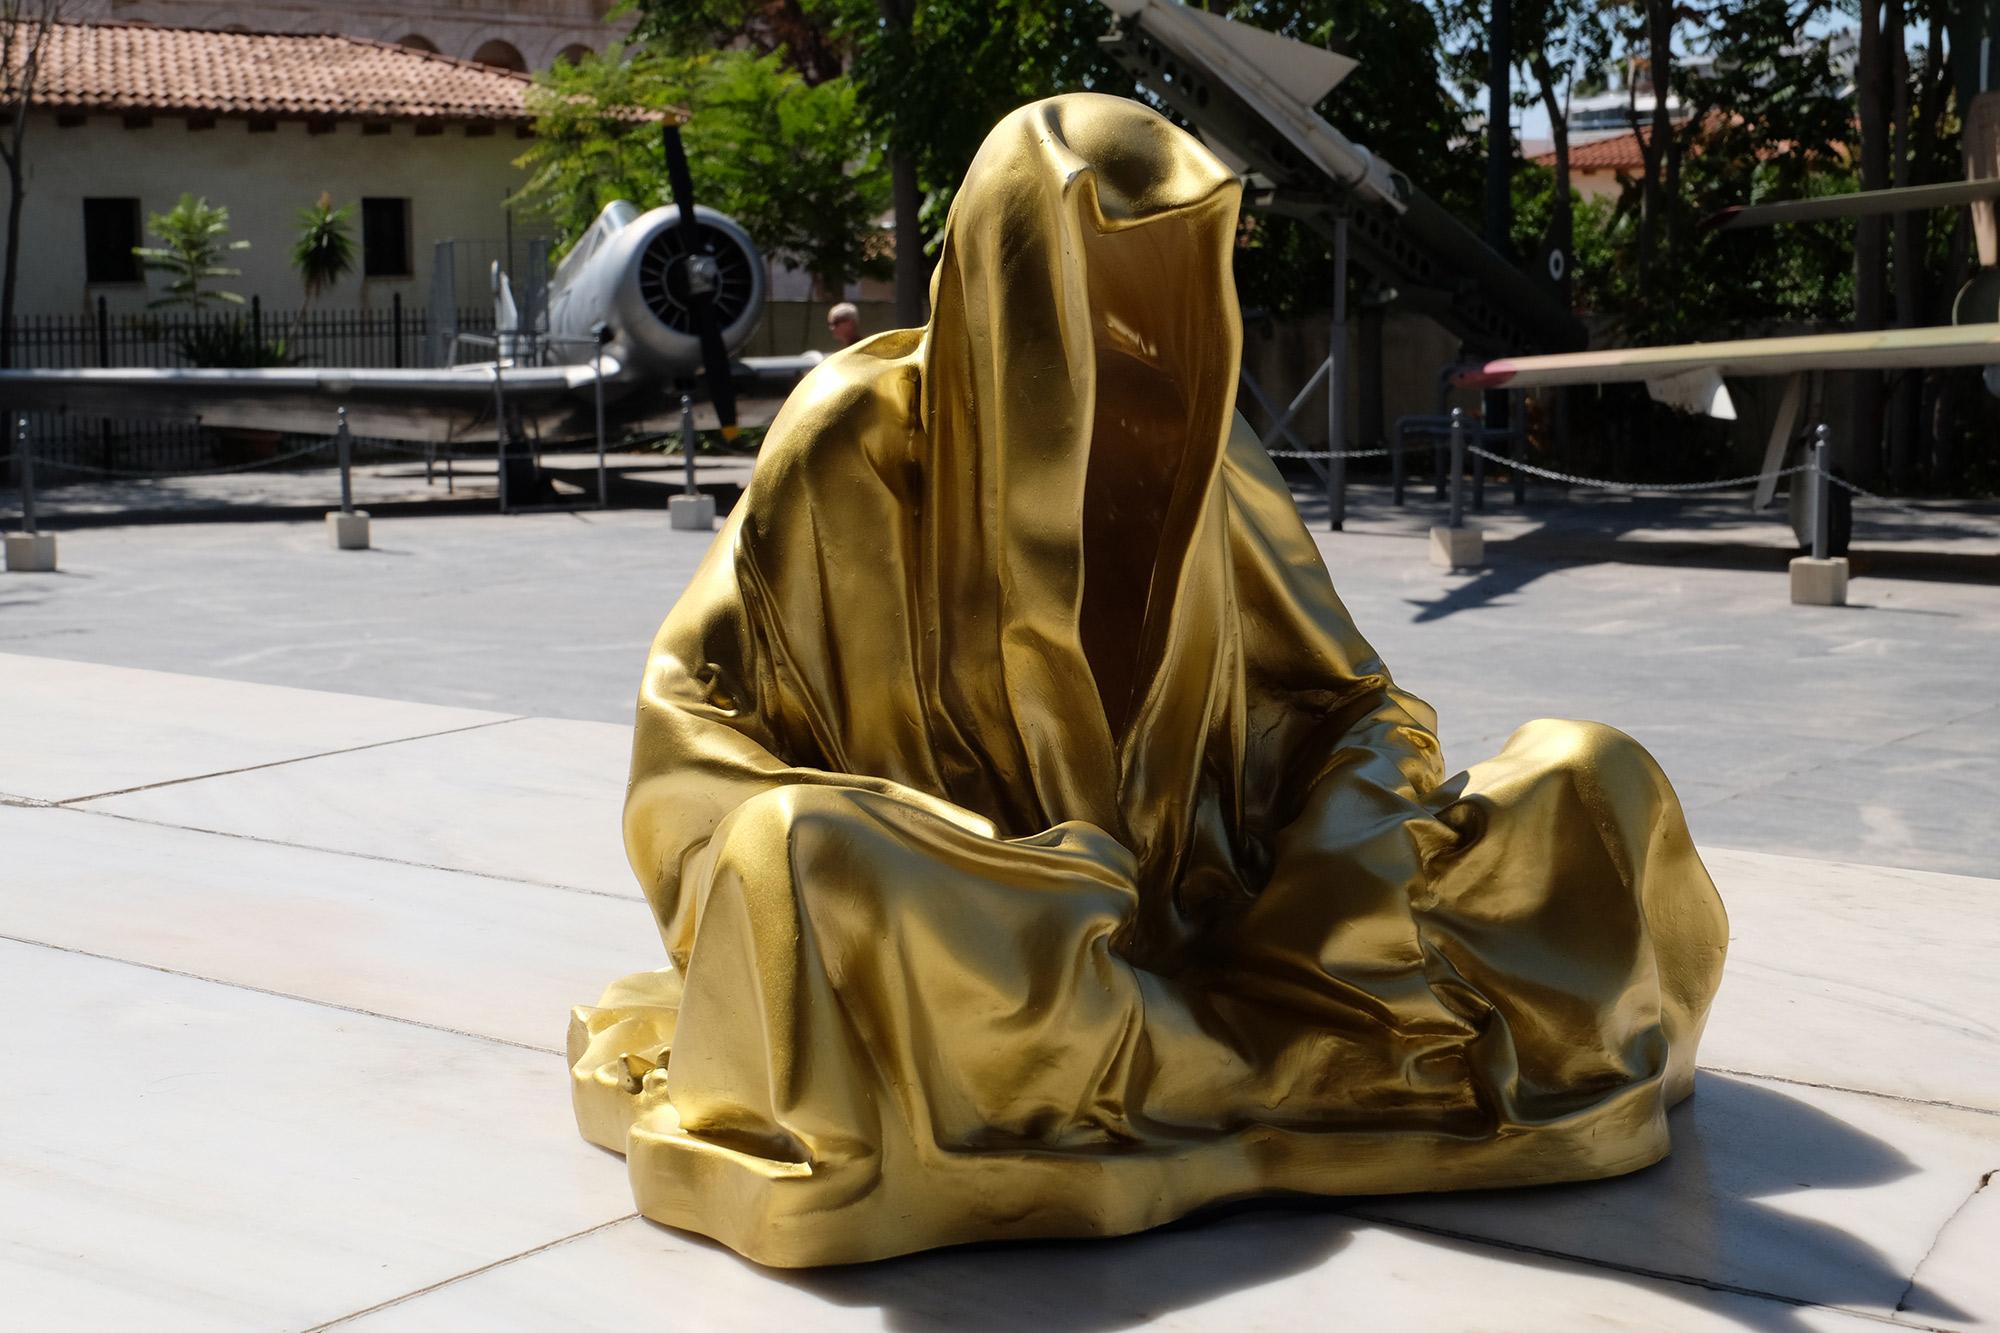 athens-acropolis-guardians-of-time-manfred-kili-kielnhofer-stone-marble-plastic-statue-sculpture-modern-art-fine-arts-arte-gallery-museum-show-8547